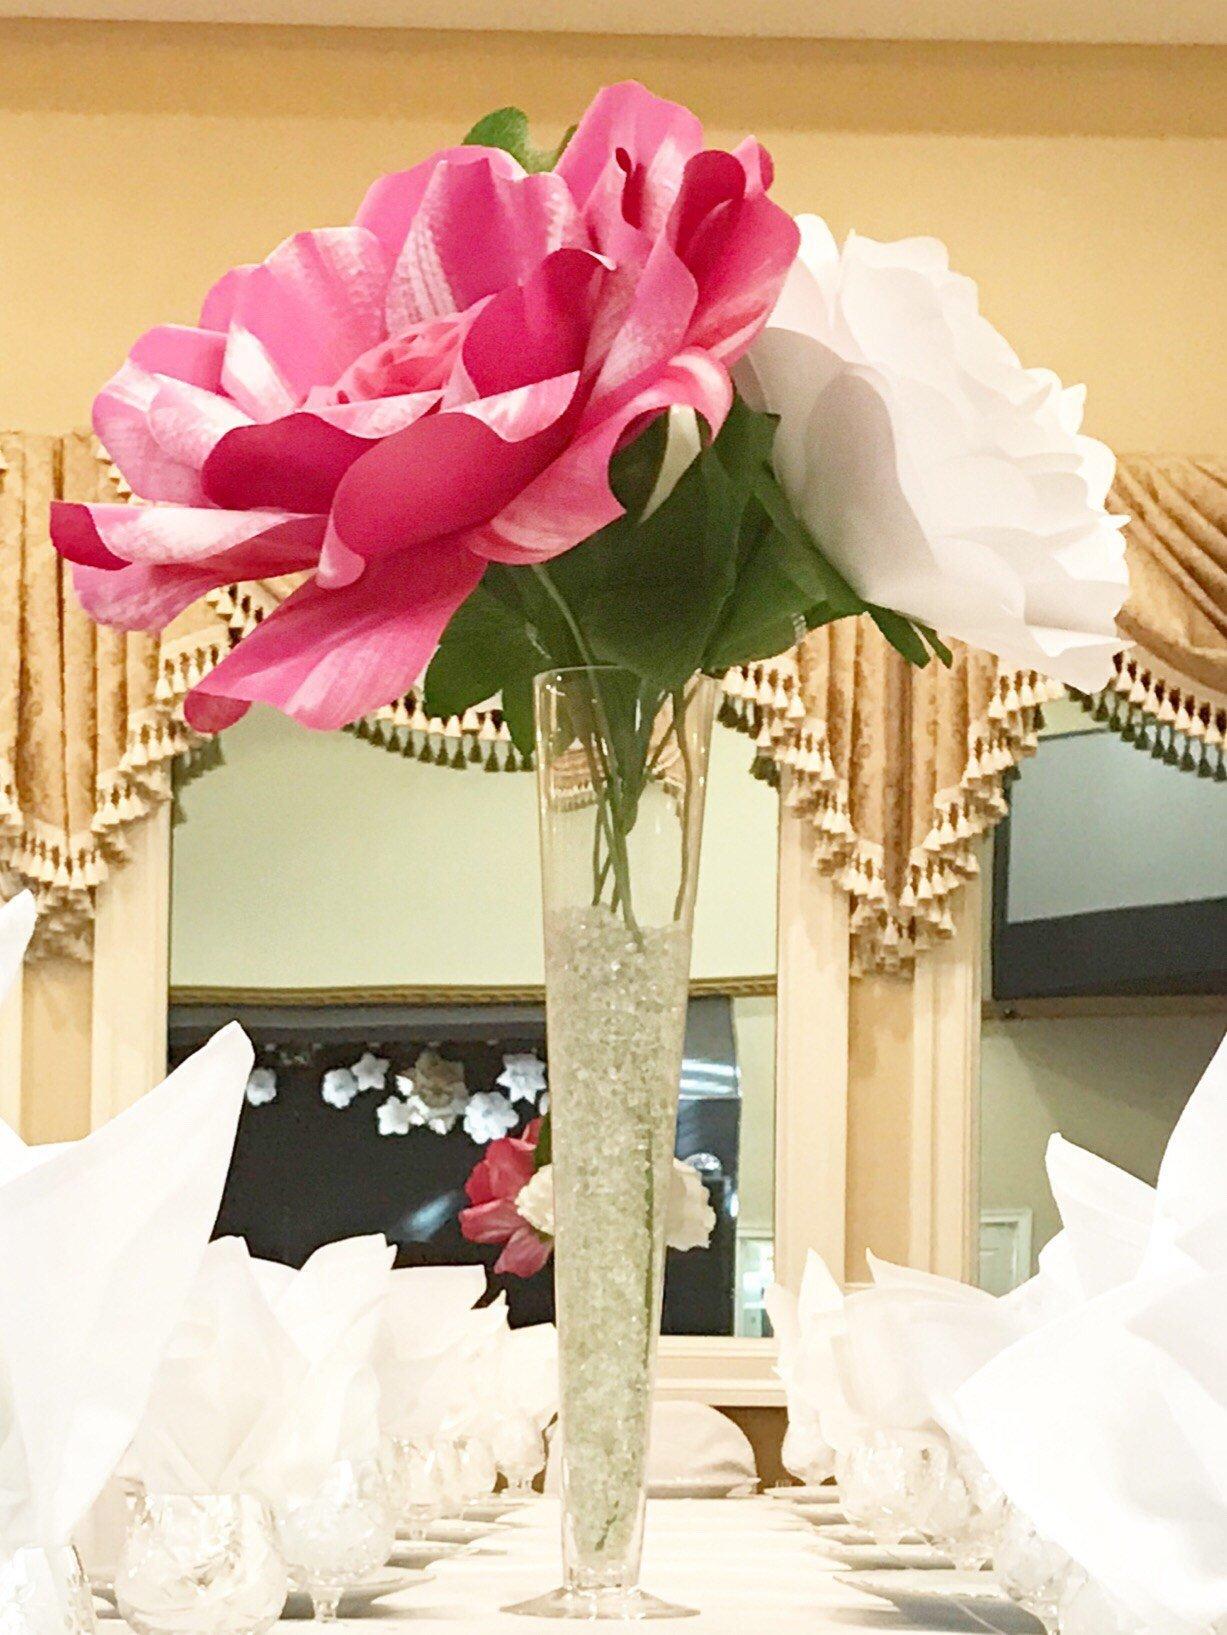 X-Large paper flower centrepiece, giant paper flower, large paper flower centrepiece, paper flower table decor